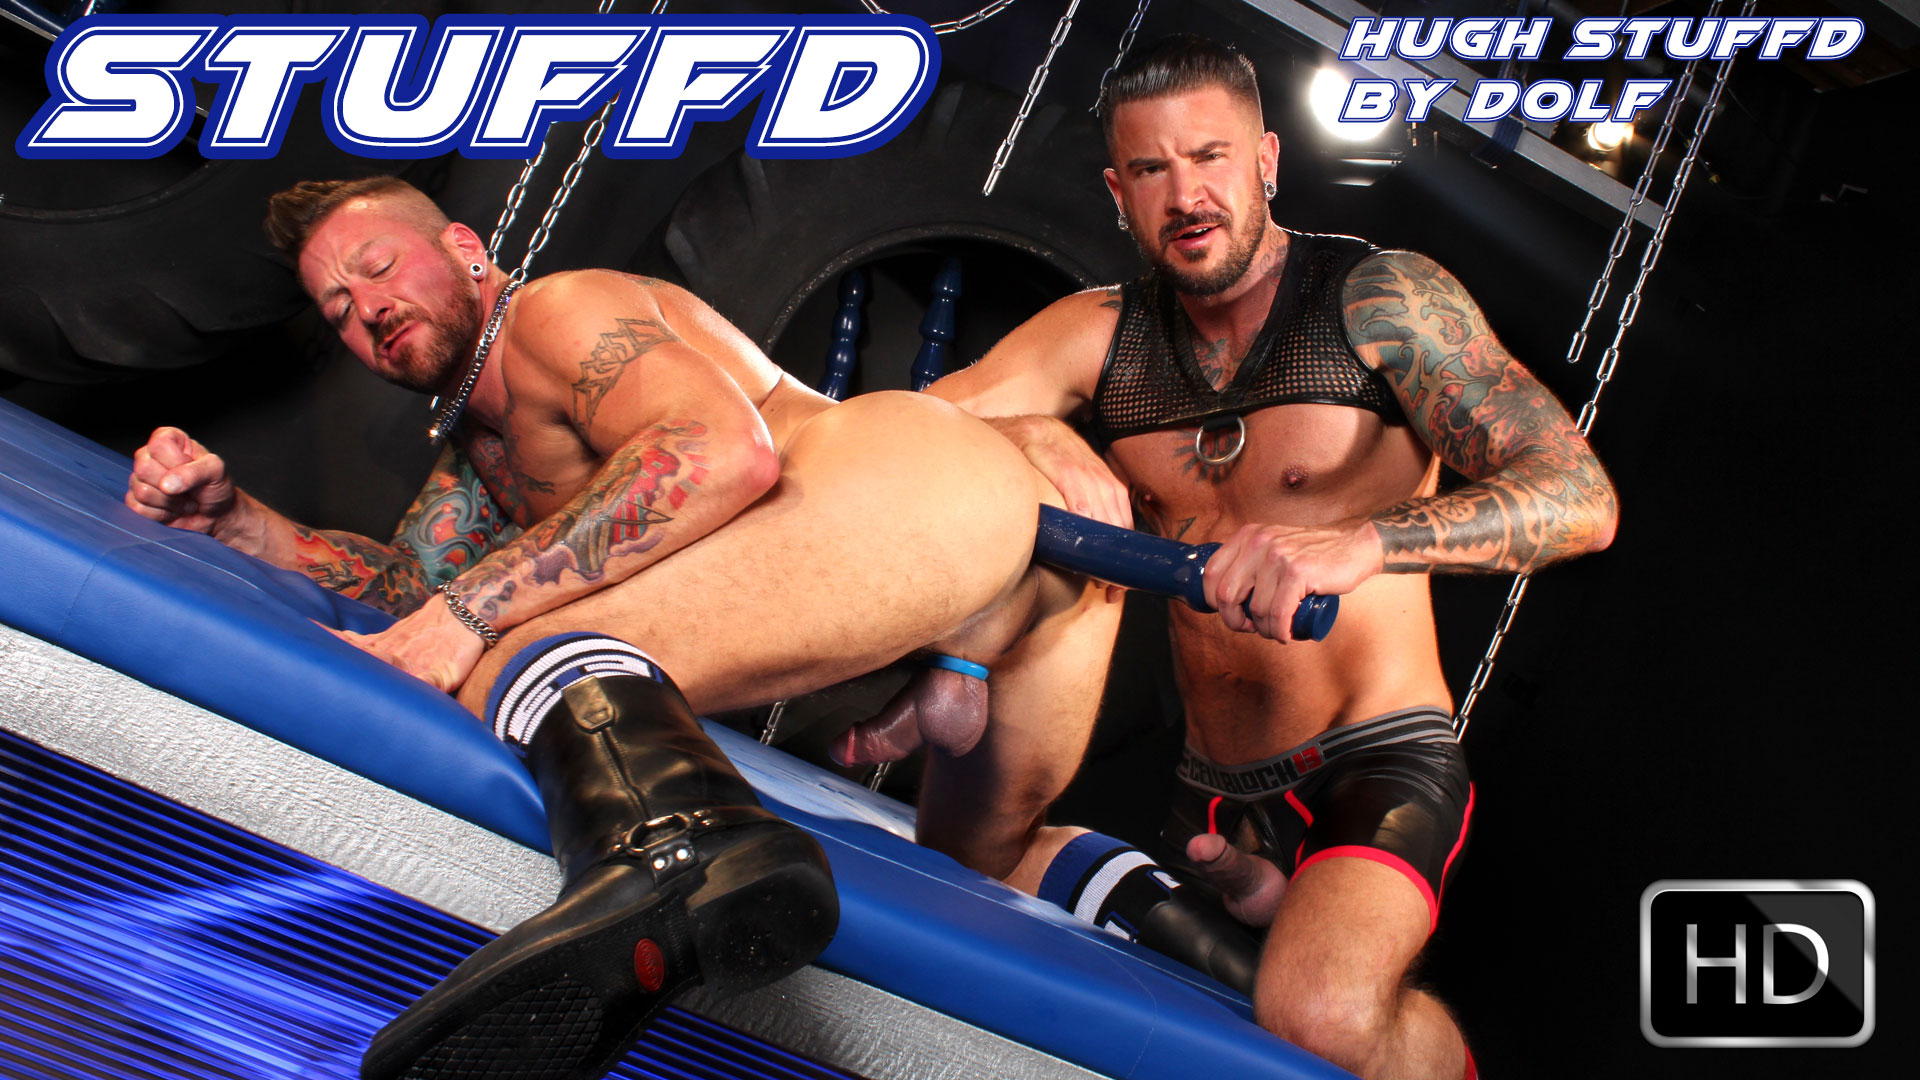 Hugh STUFFD by Dolf